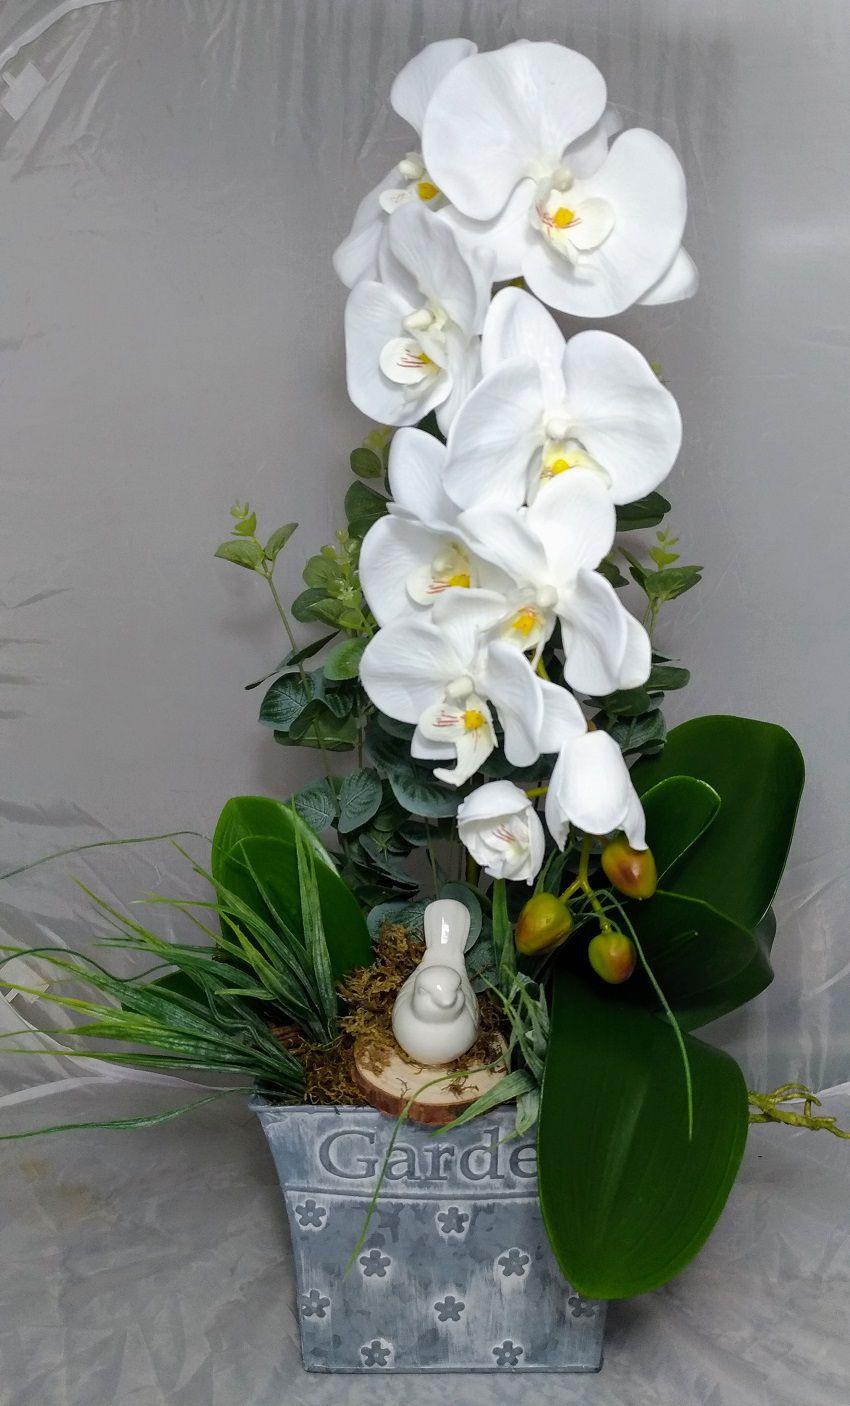 Vaso Cinza Garden c/ Orquídea Branca e Passarinho